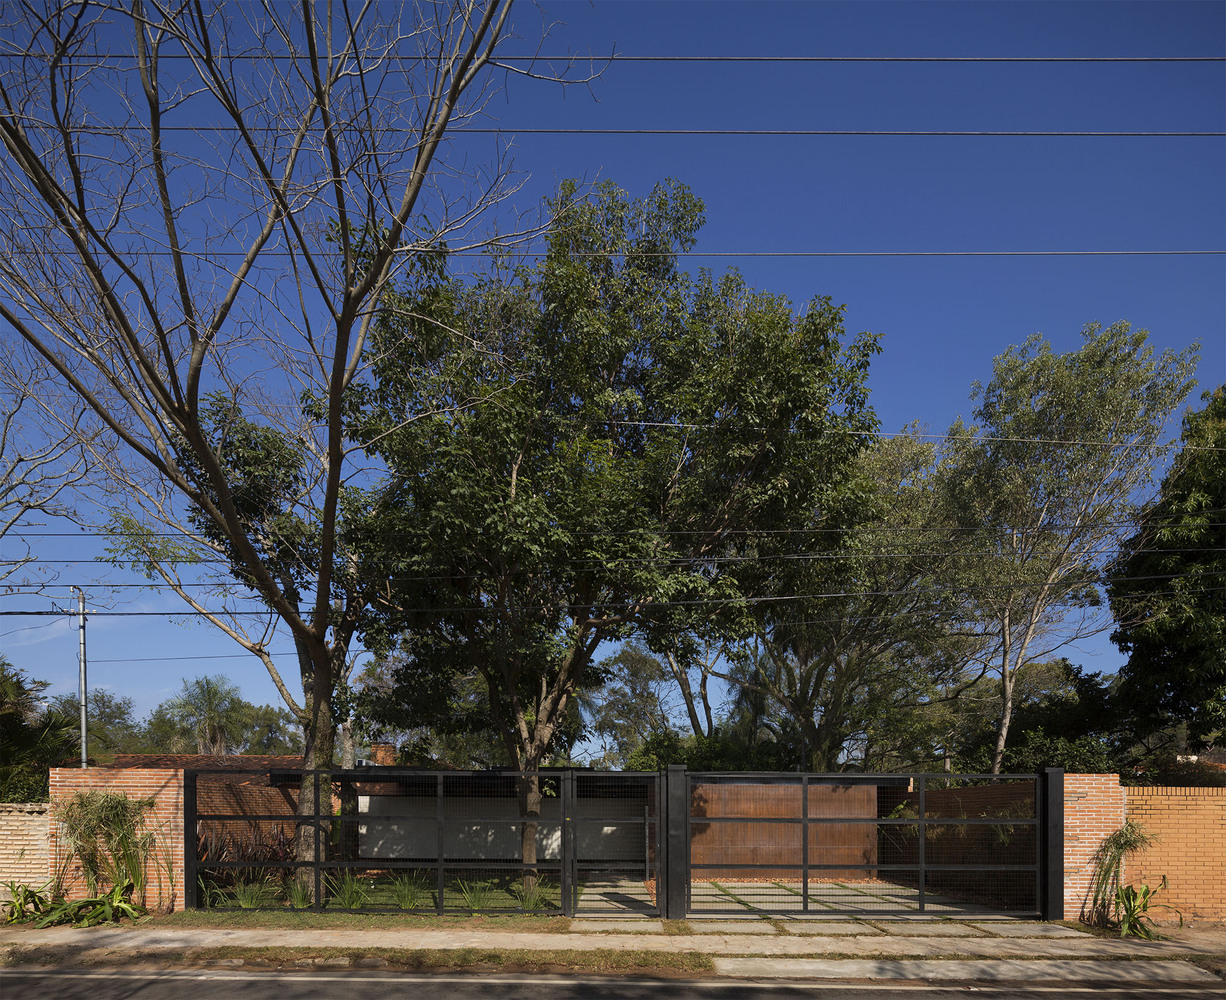 7_La Escondida House_Nou arquitectos_Inspirationist